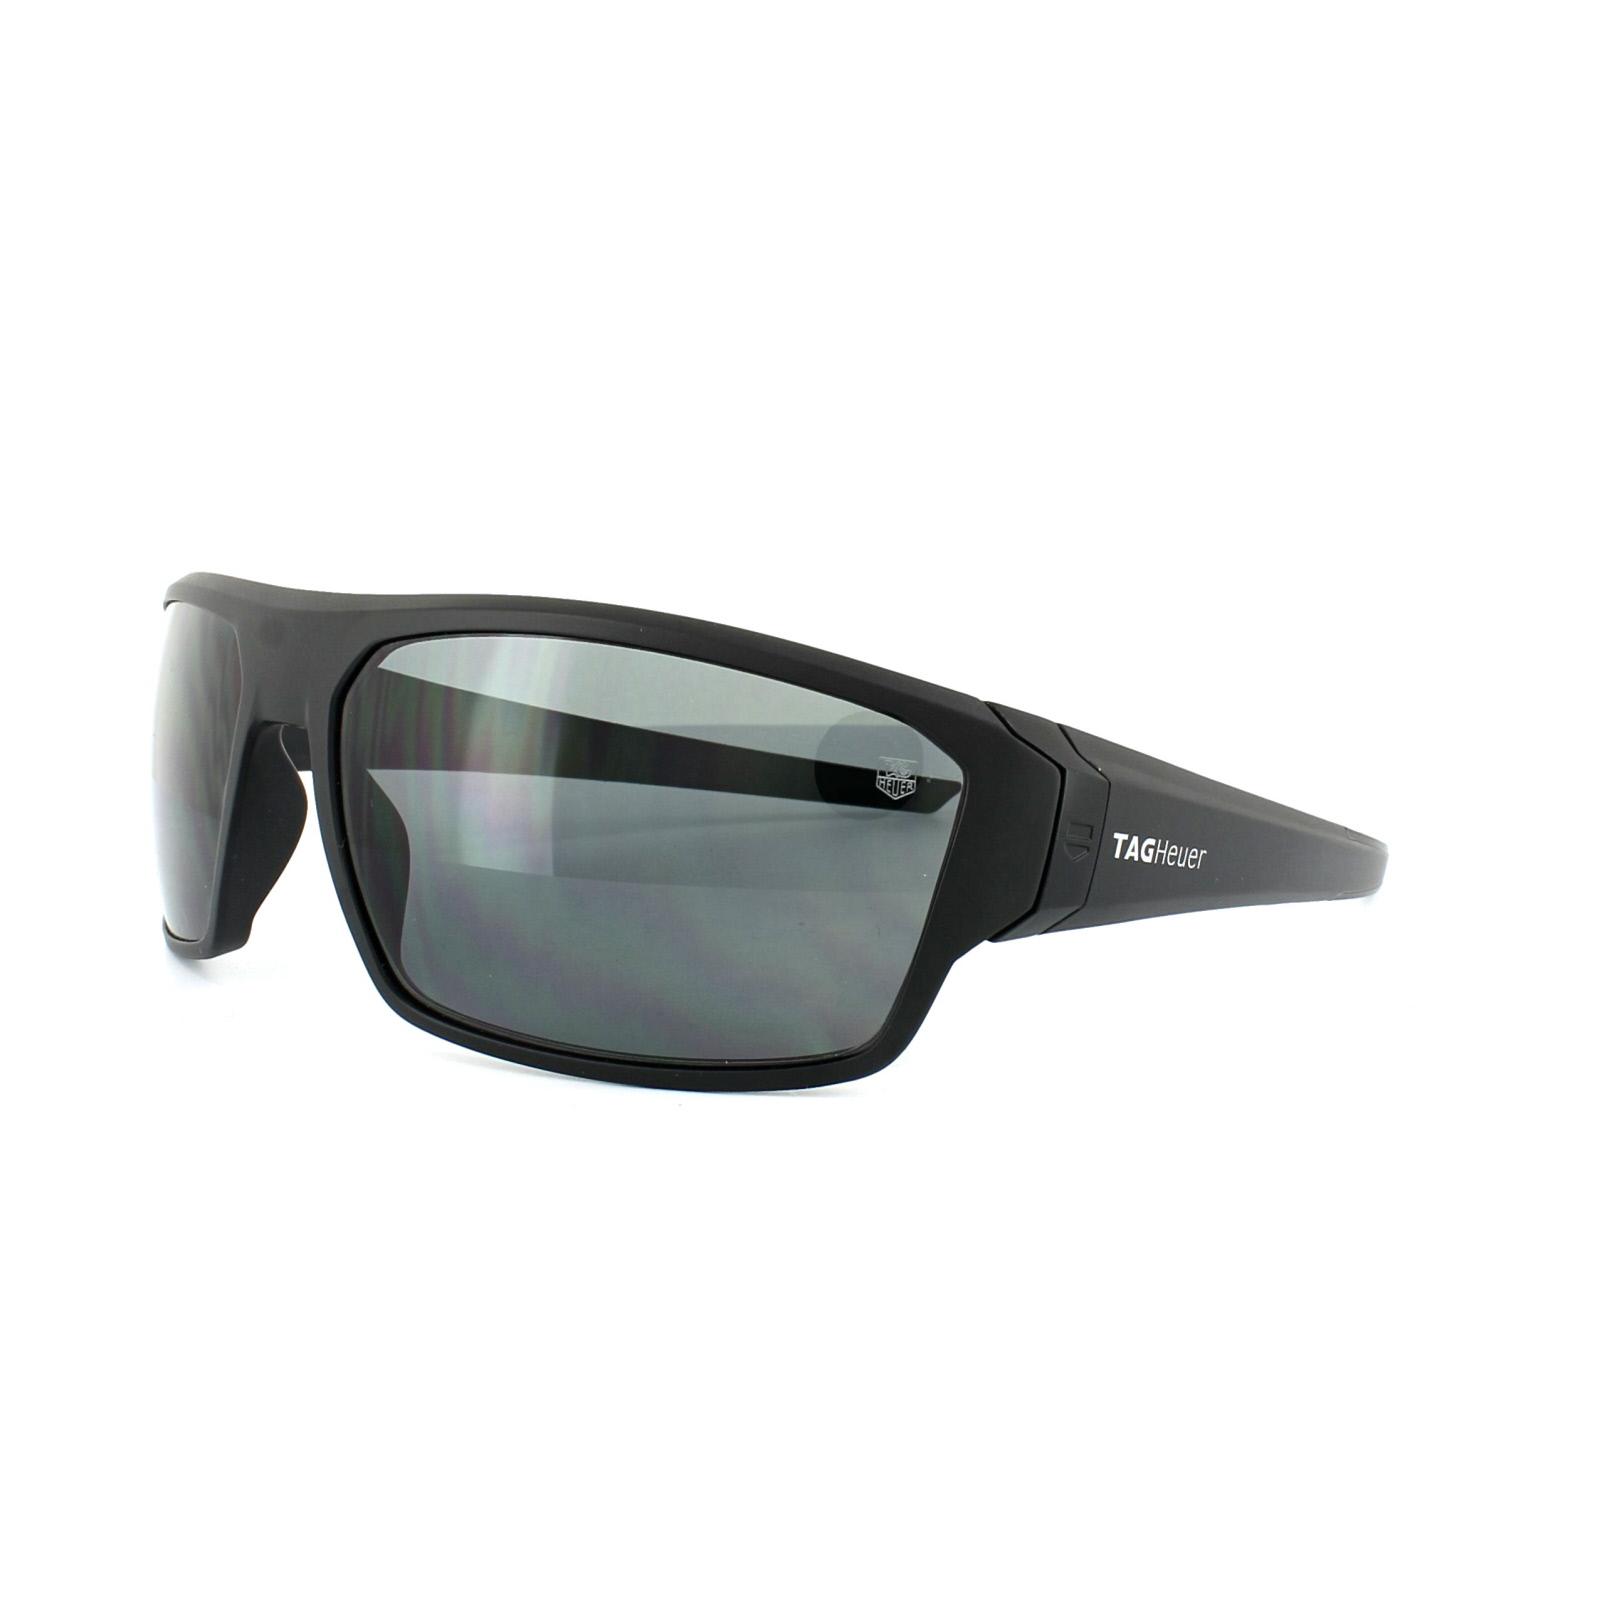 d441e1cf41 Cheap Tag Heuer Sunglasses - Discounted Sunglasses